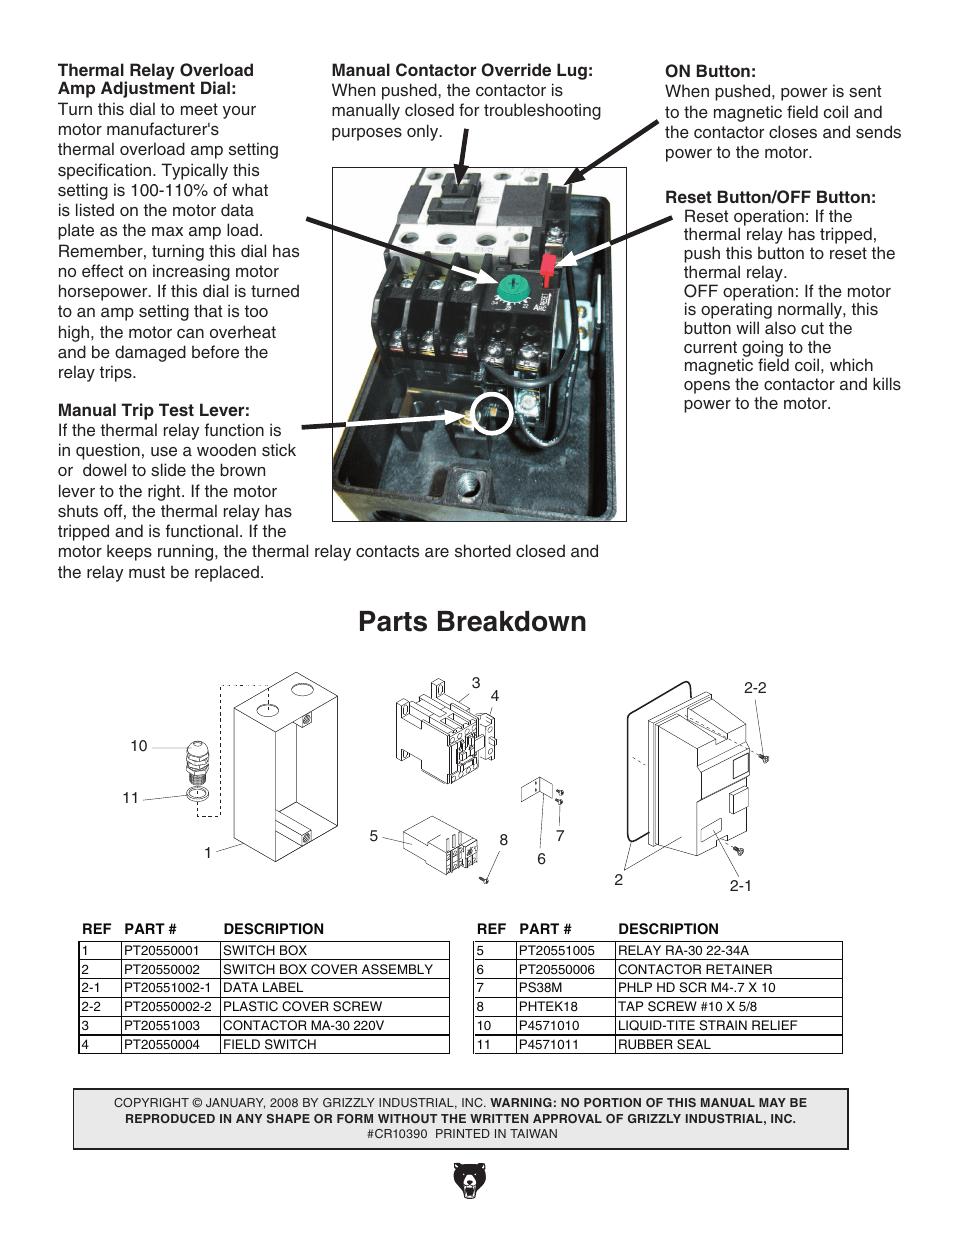 Malaguti Grizzly 10 Repair Manual